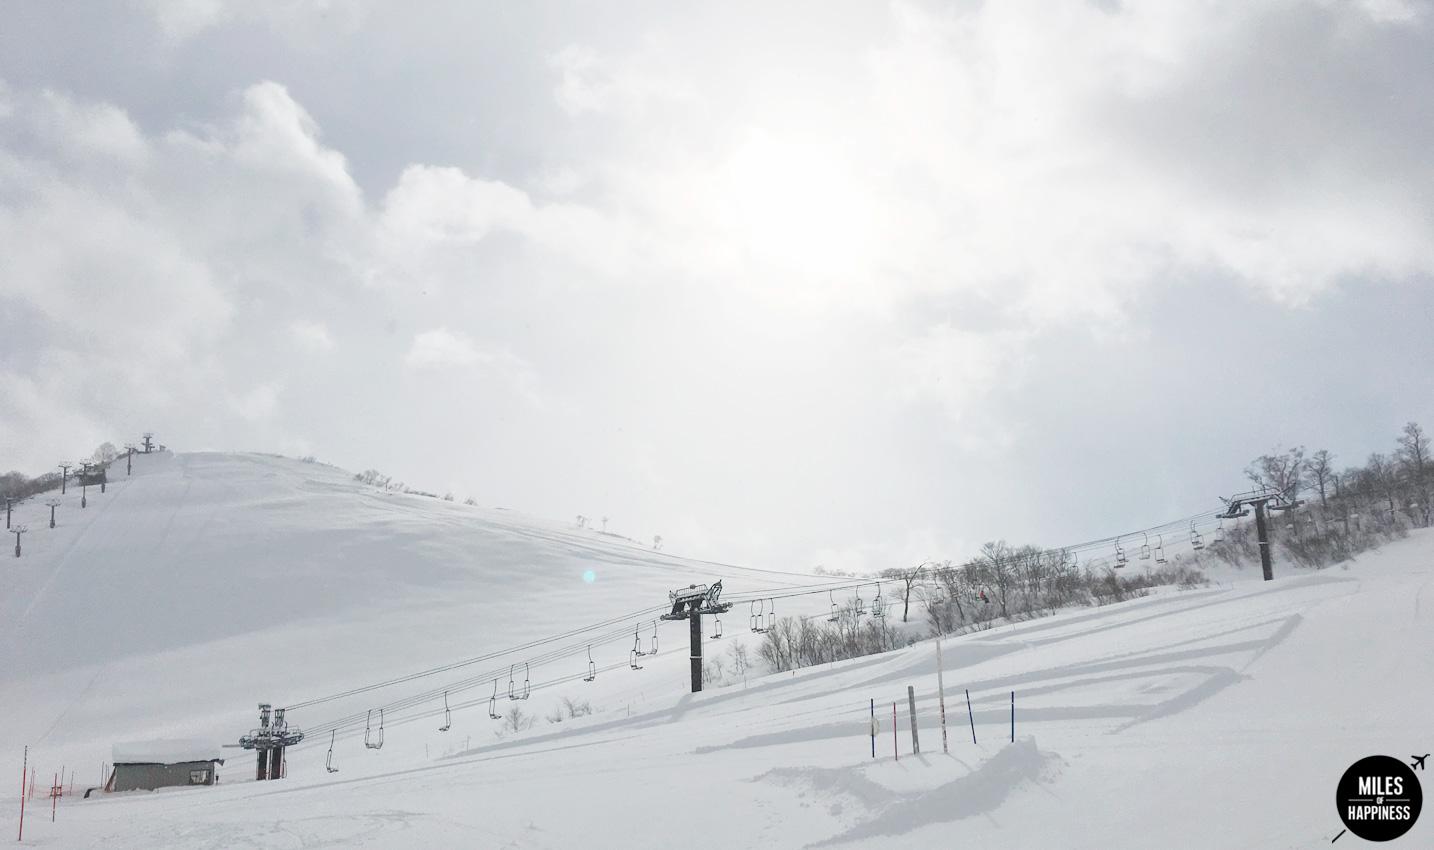 Itinerary of a ski trip in Honshu